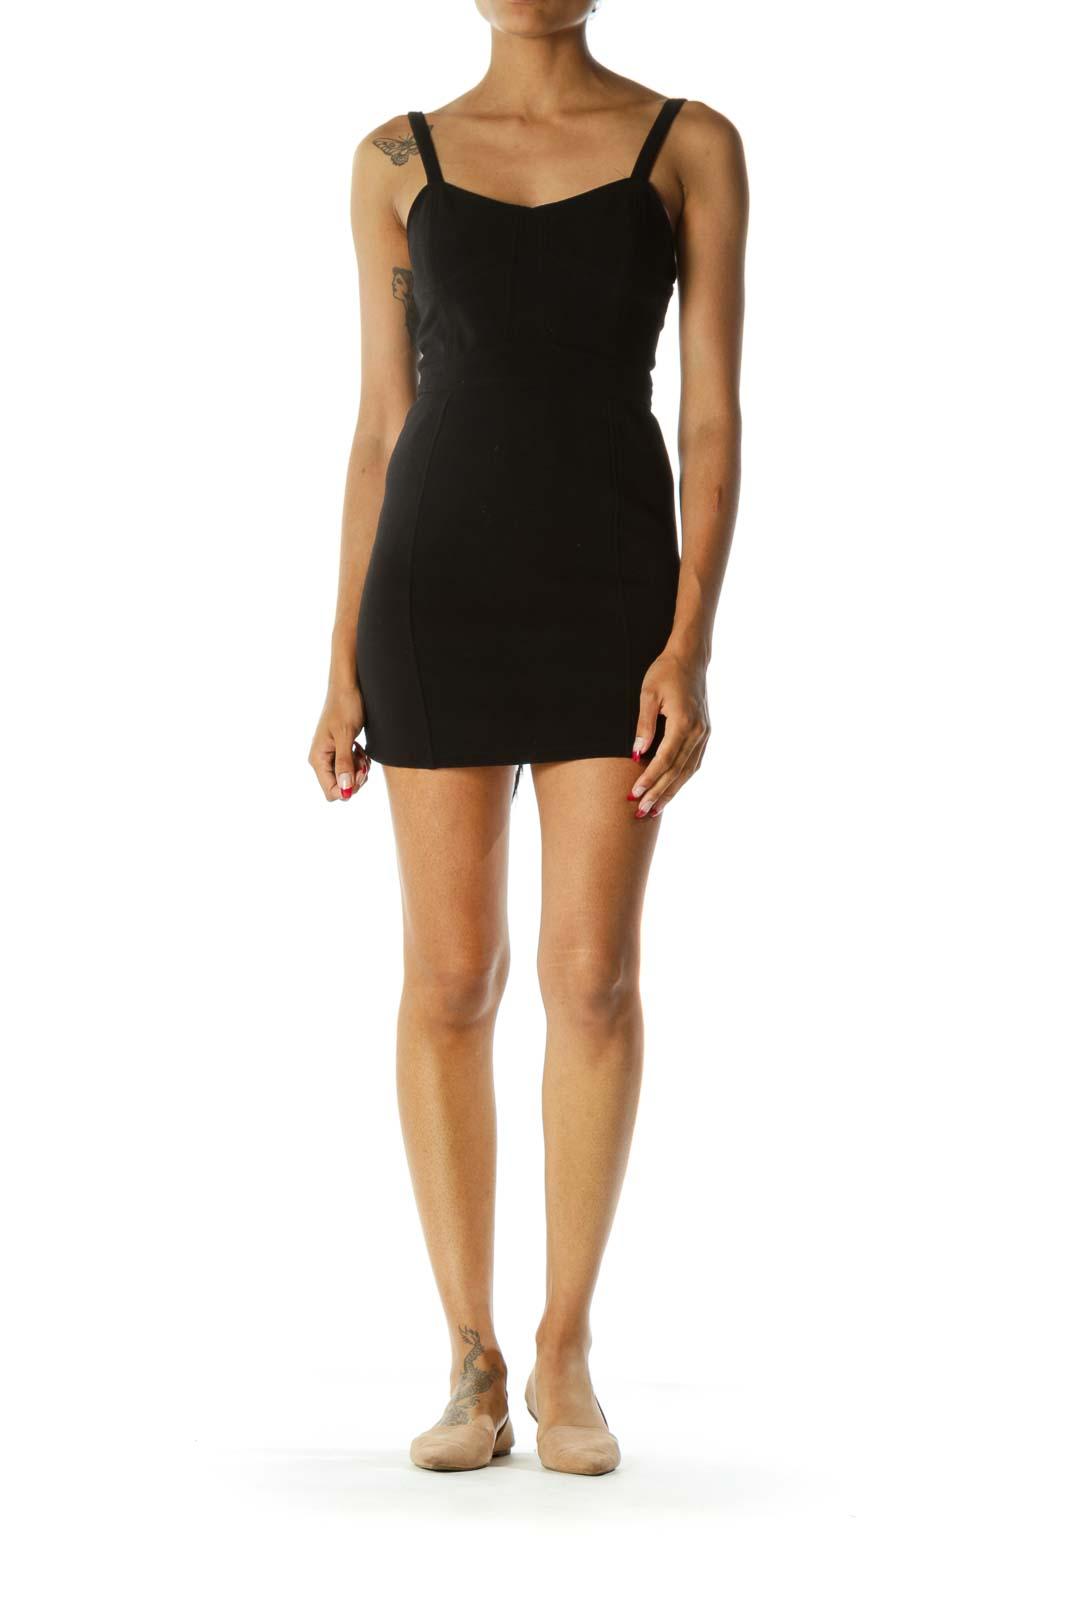 Black Sweetheart Neckline Zippered Cut Out Cocktail Dress